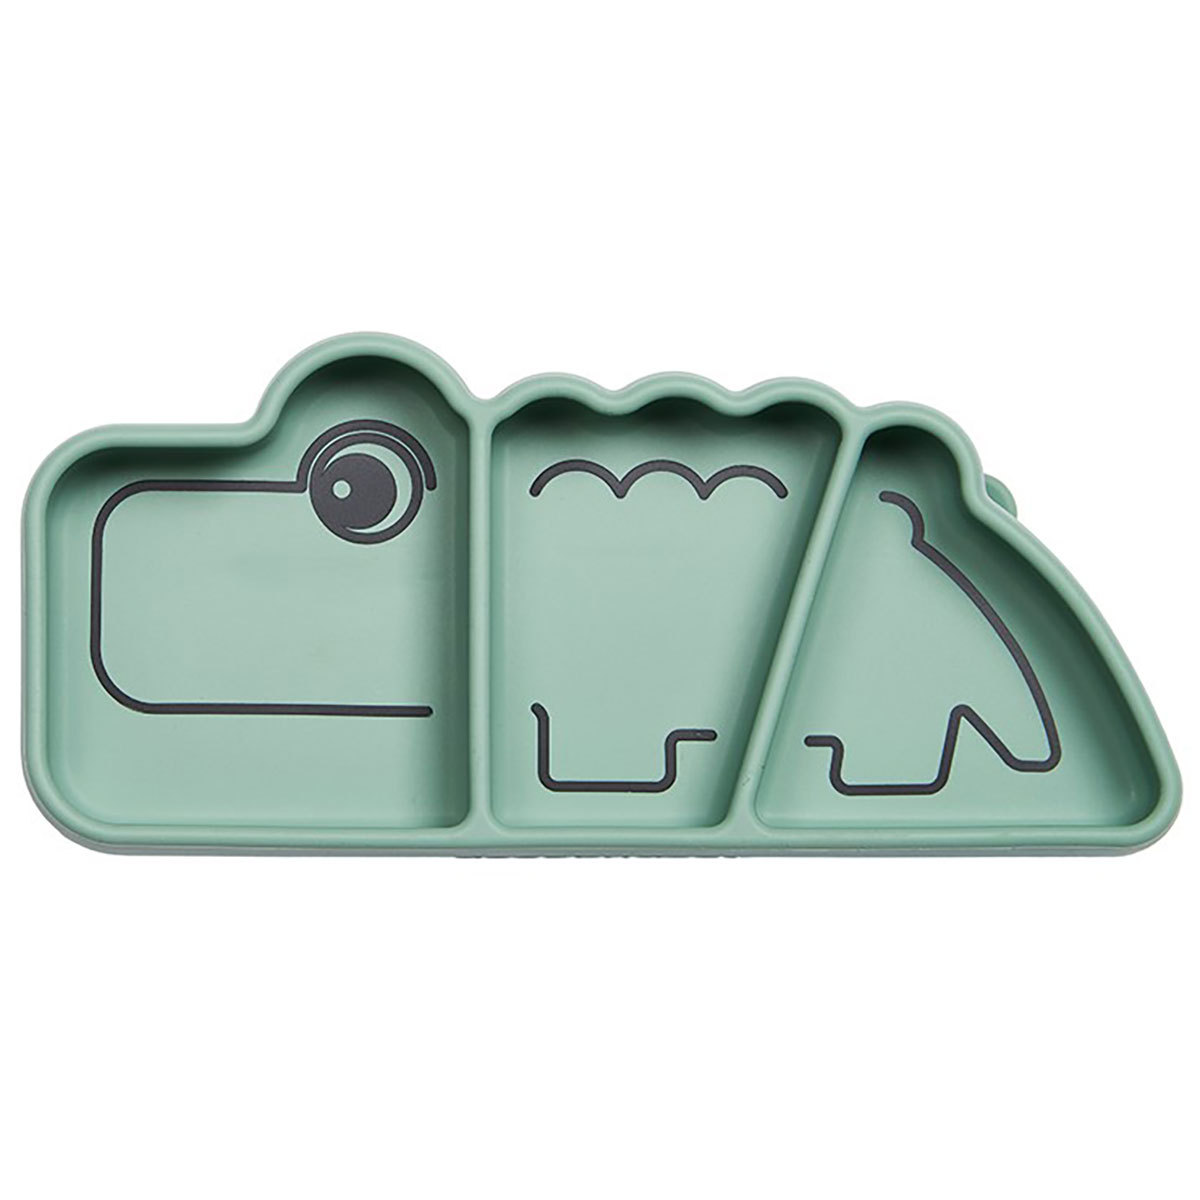 Vaisselle & Couvert Assiette Silicone Croco - Vert